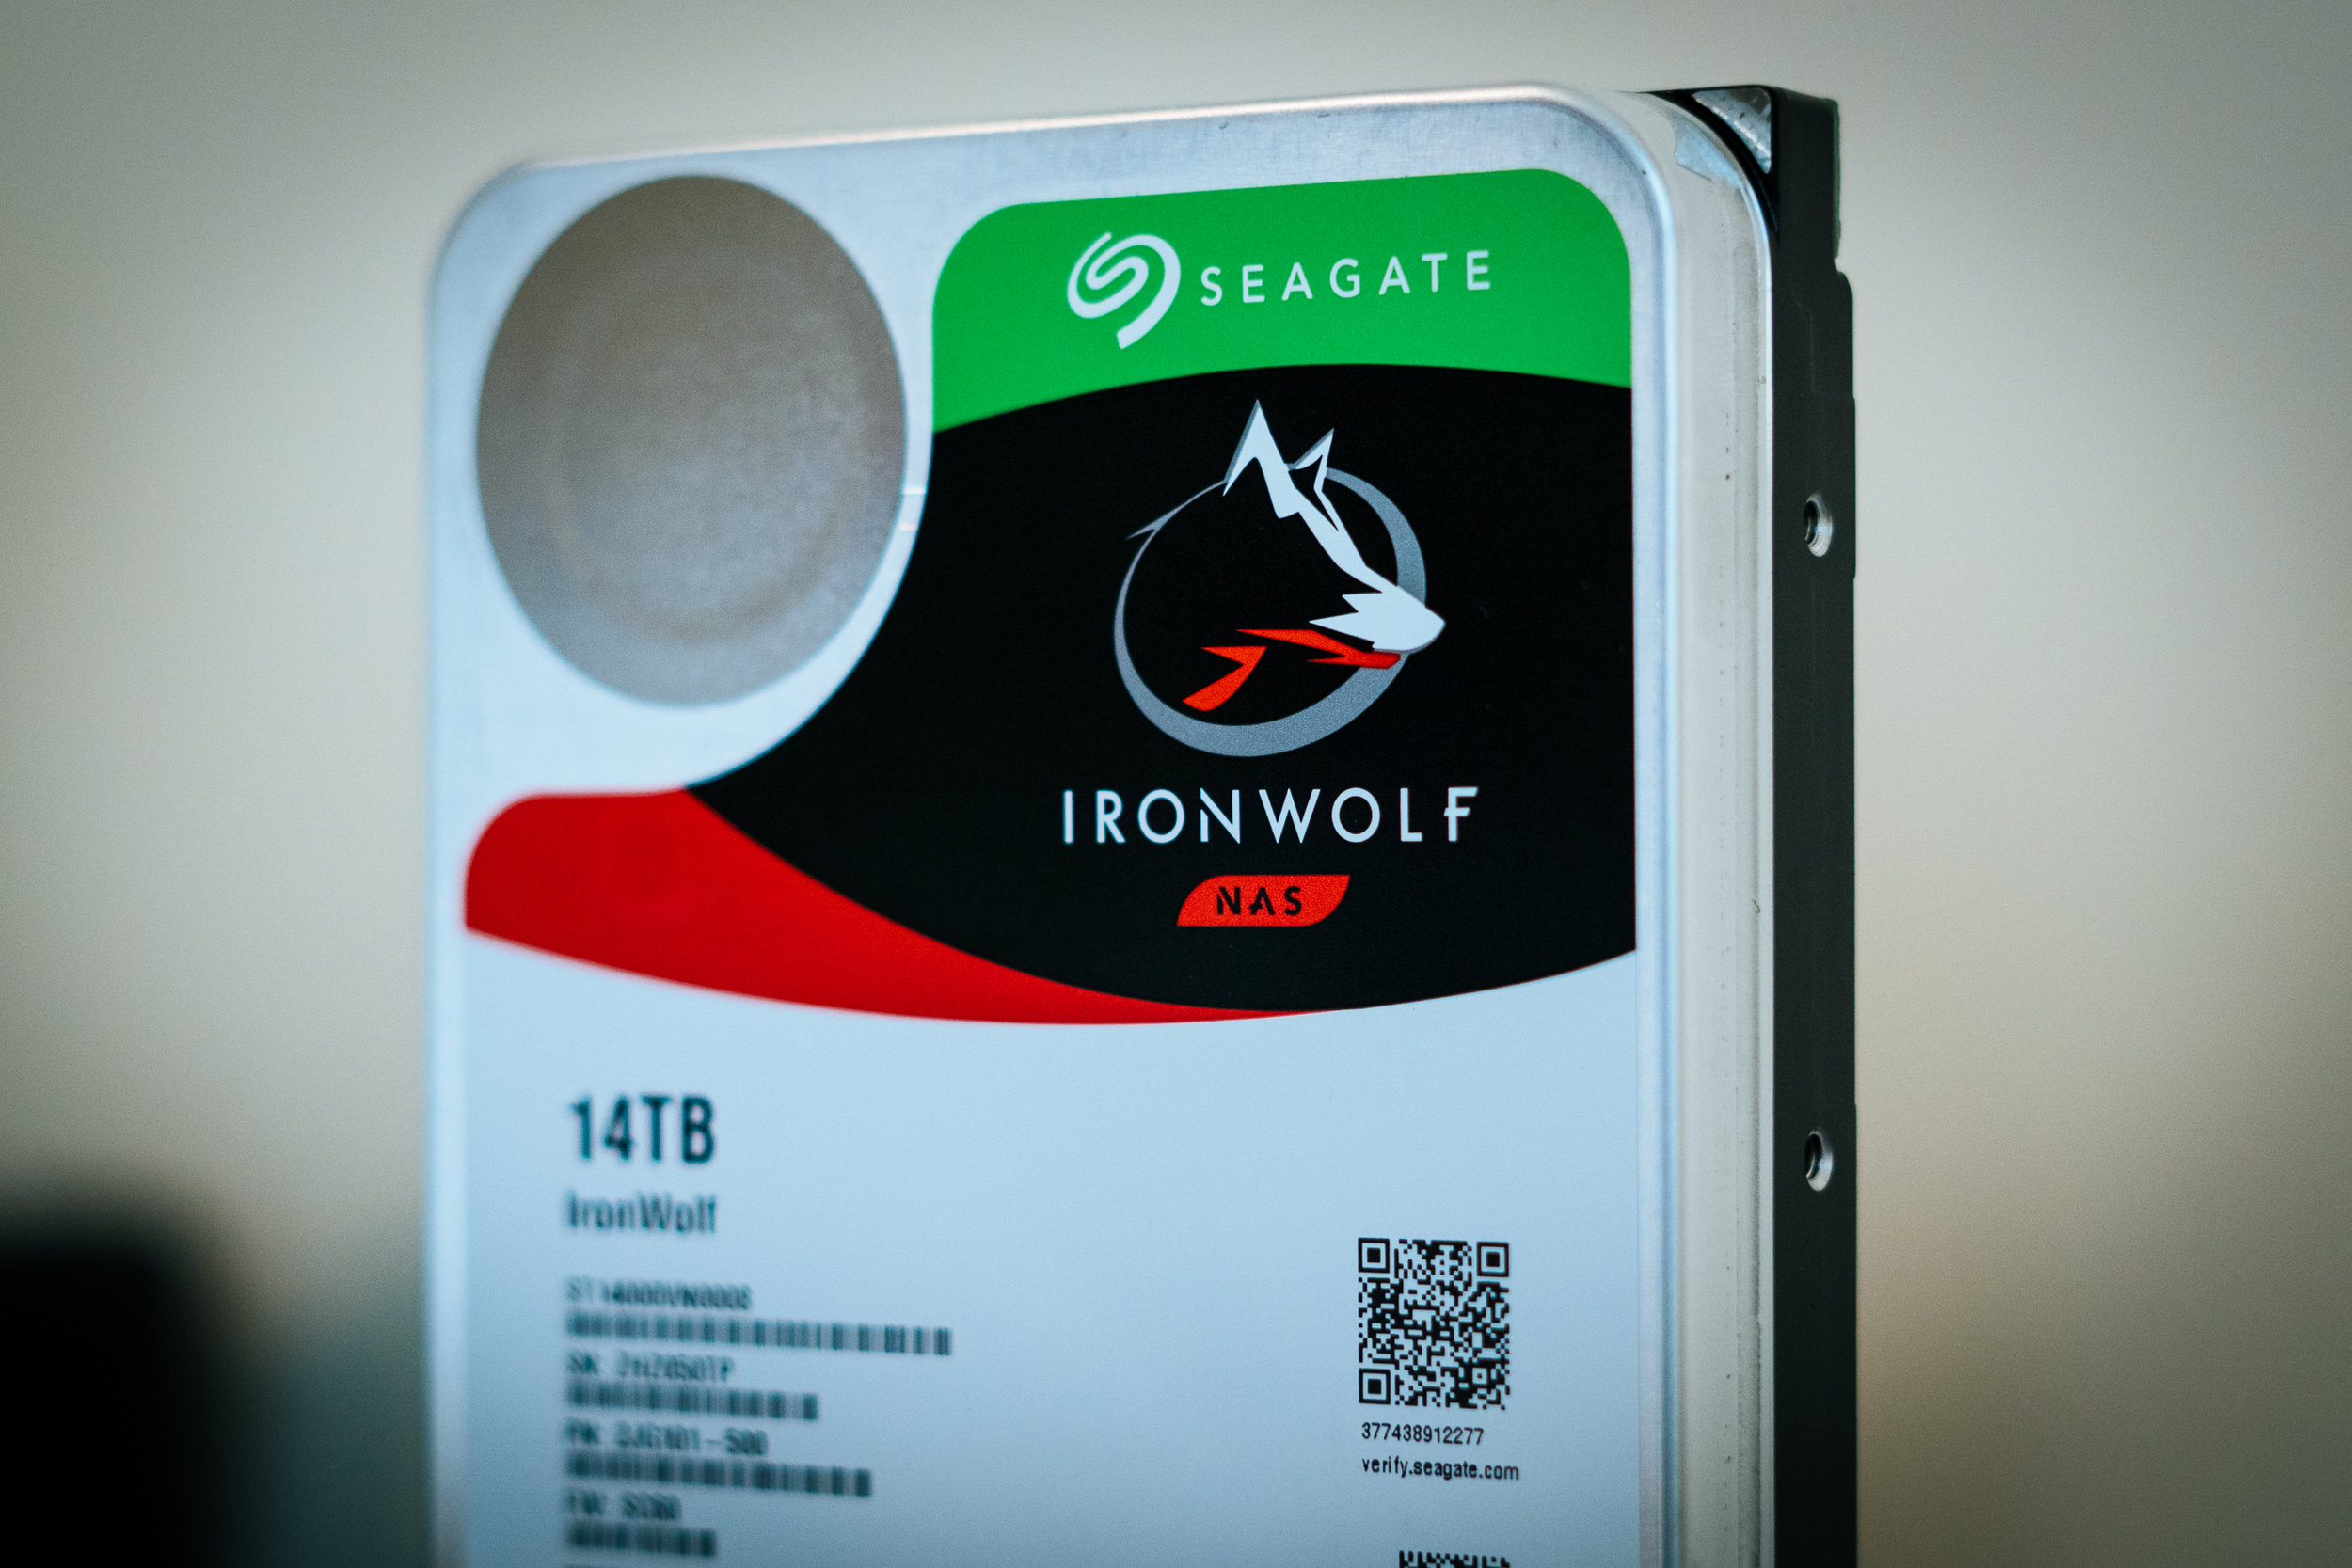 ironwolf-02676.jpg